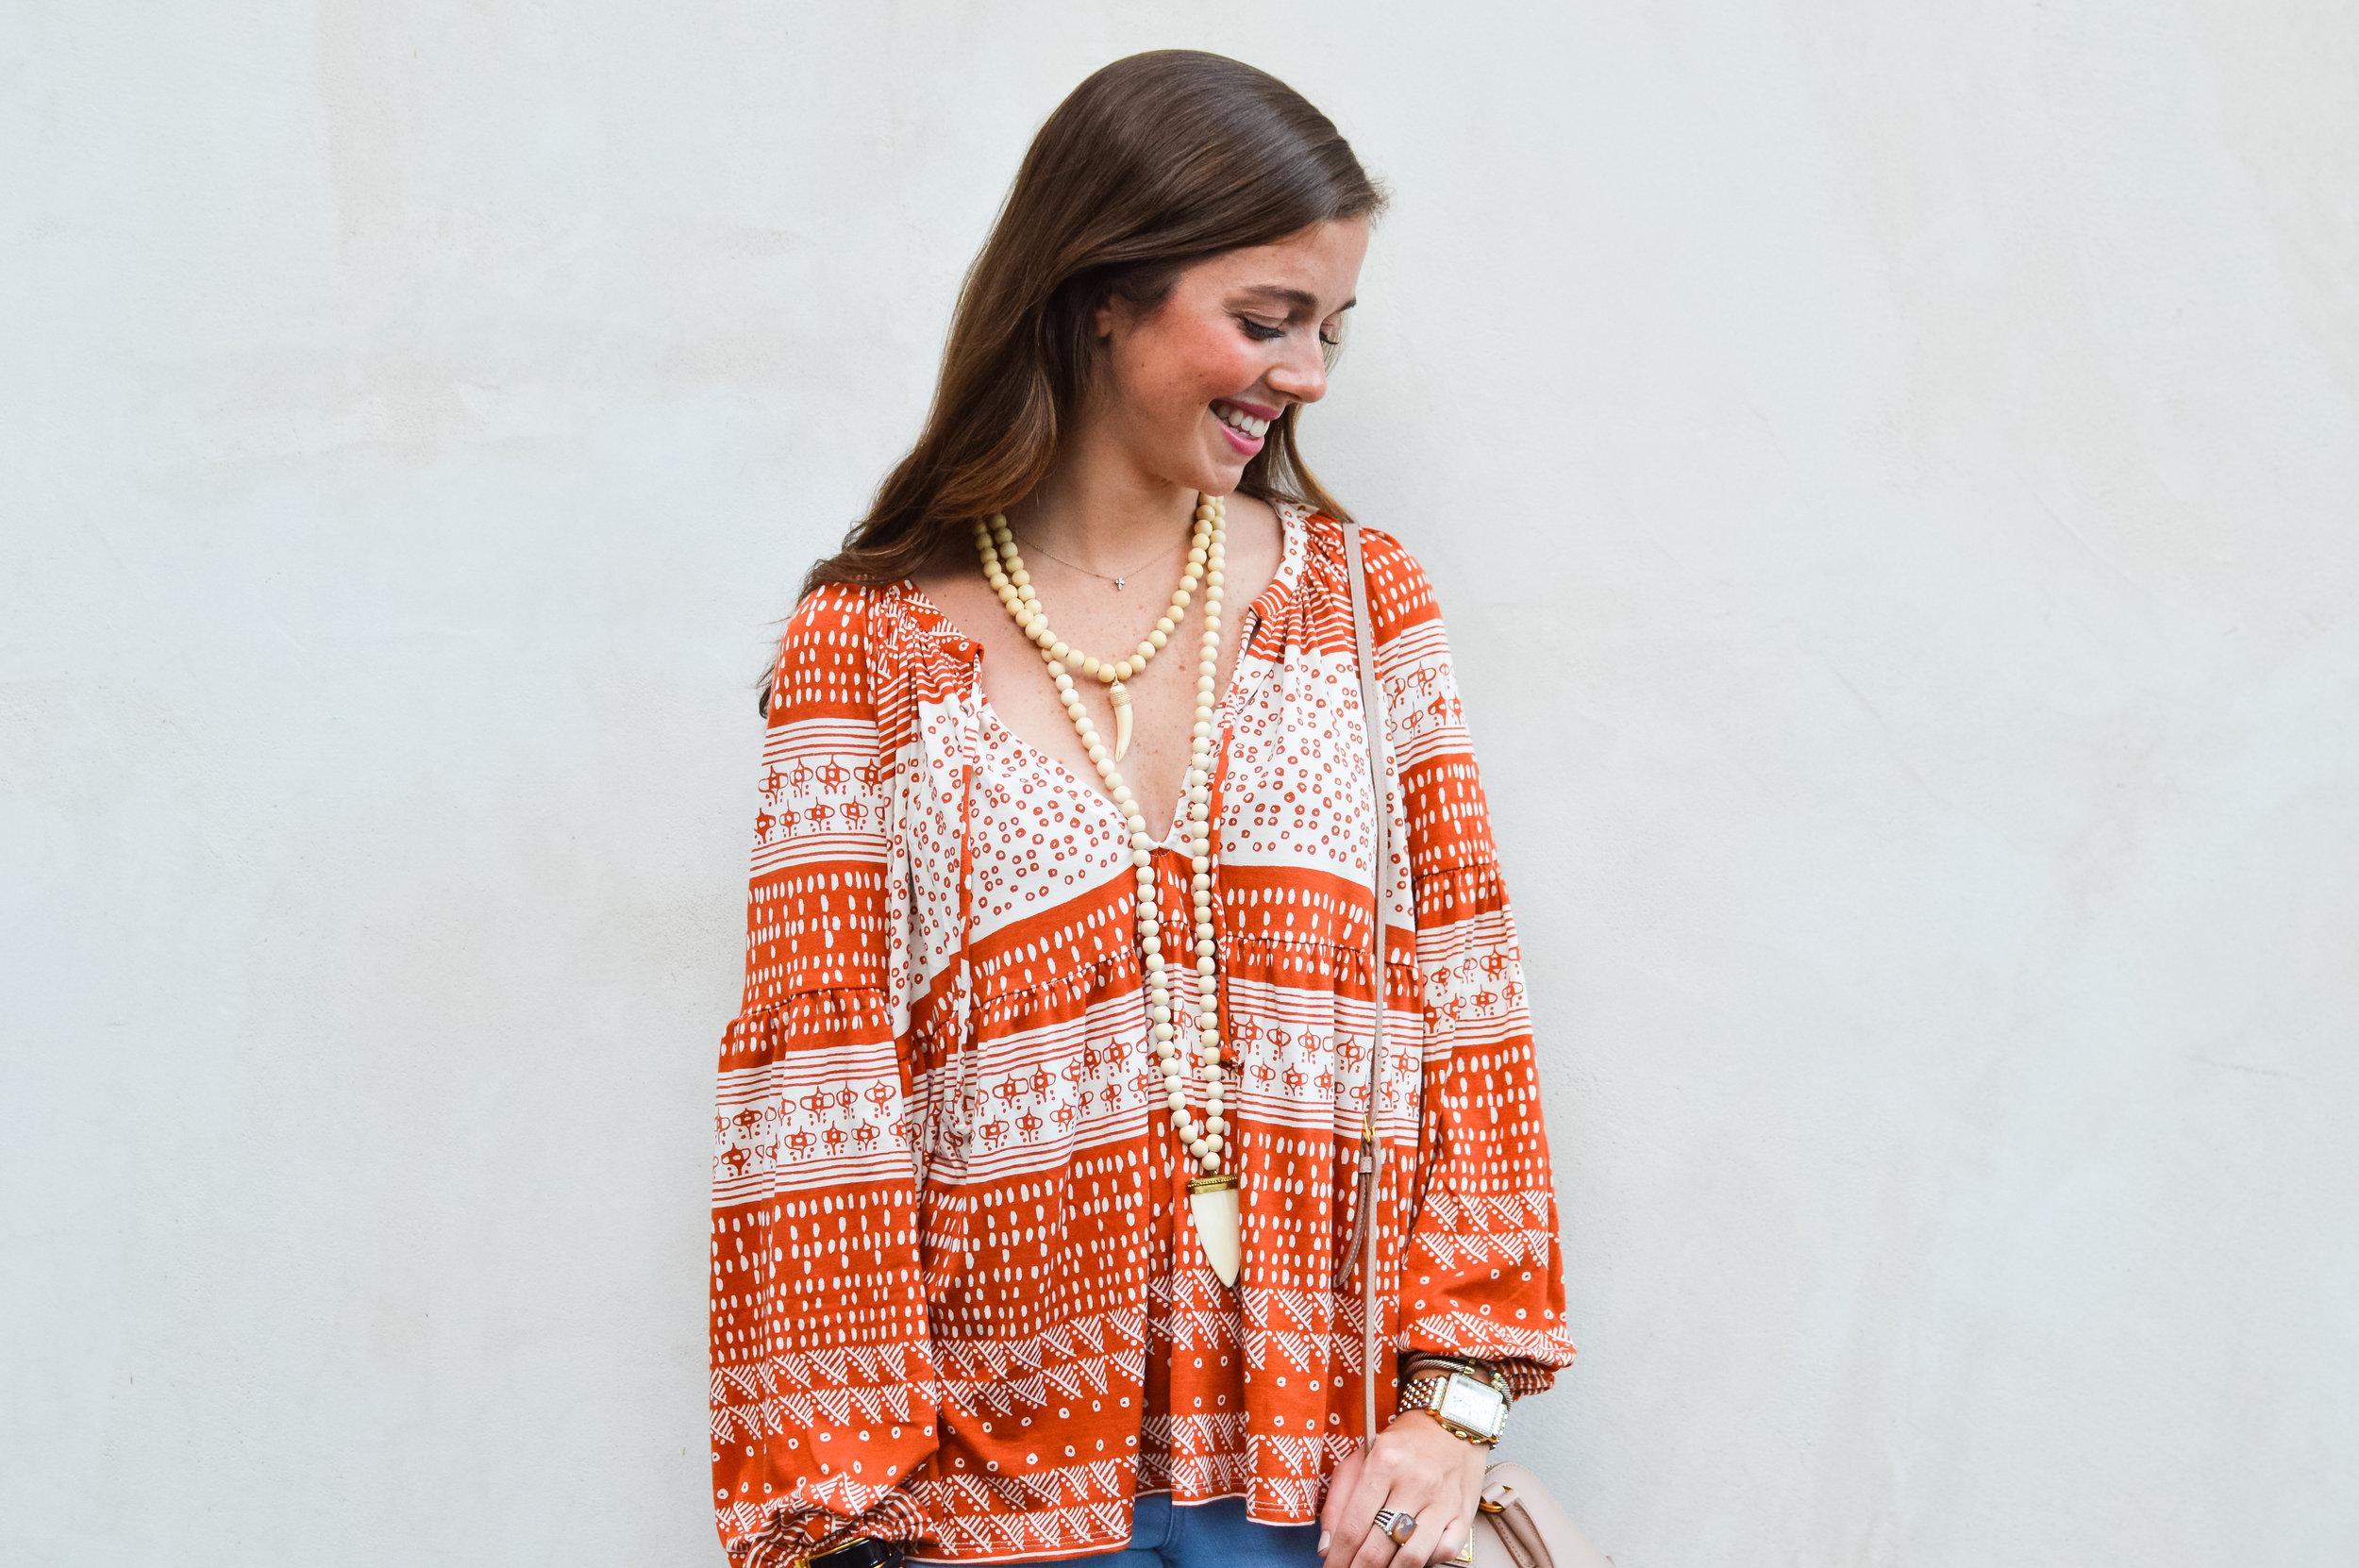 fashion blogger lcb style rachel pally (17 of 18).jpg